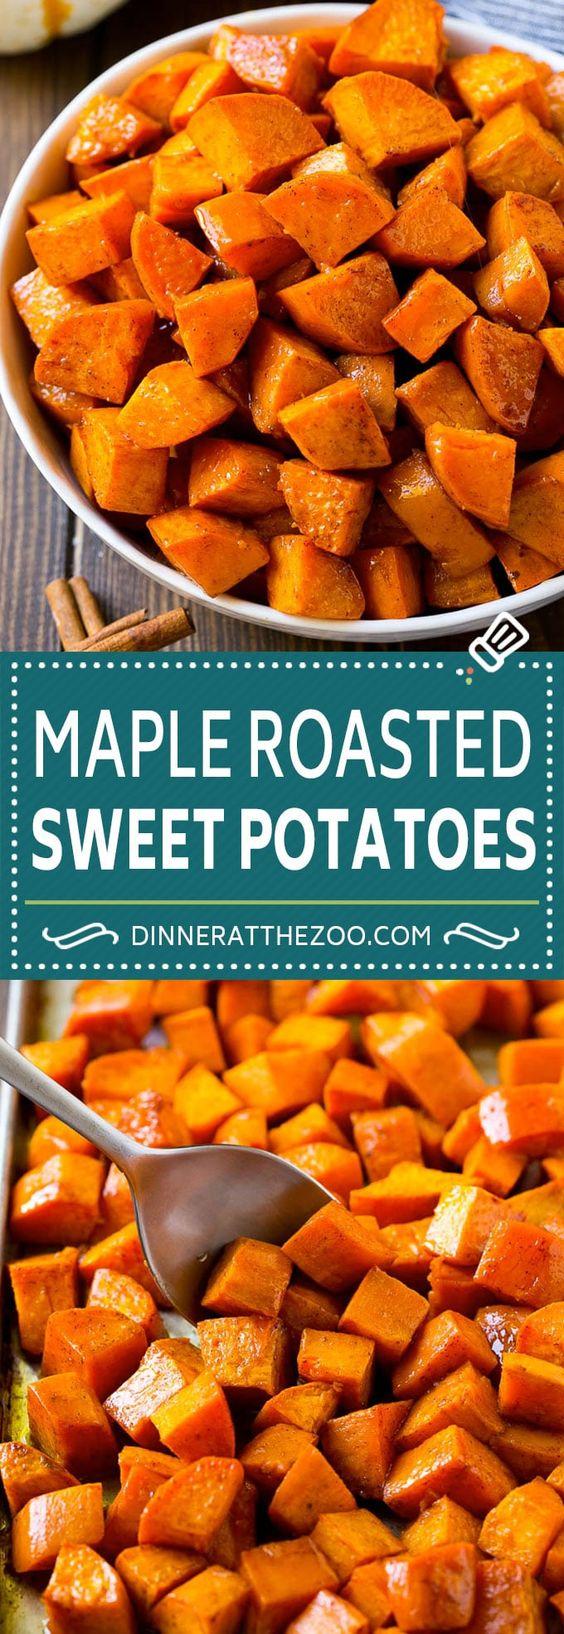 Maple Roasted Sweet Potatoes Recipe | Easy Sweet Potatoes | Baked Sweet Potatoes | Sweet Potato Side Dish #sweetpotatoes #cinnamon #maple #butter #fall #sidedish #dinner #dinneratthezoo